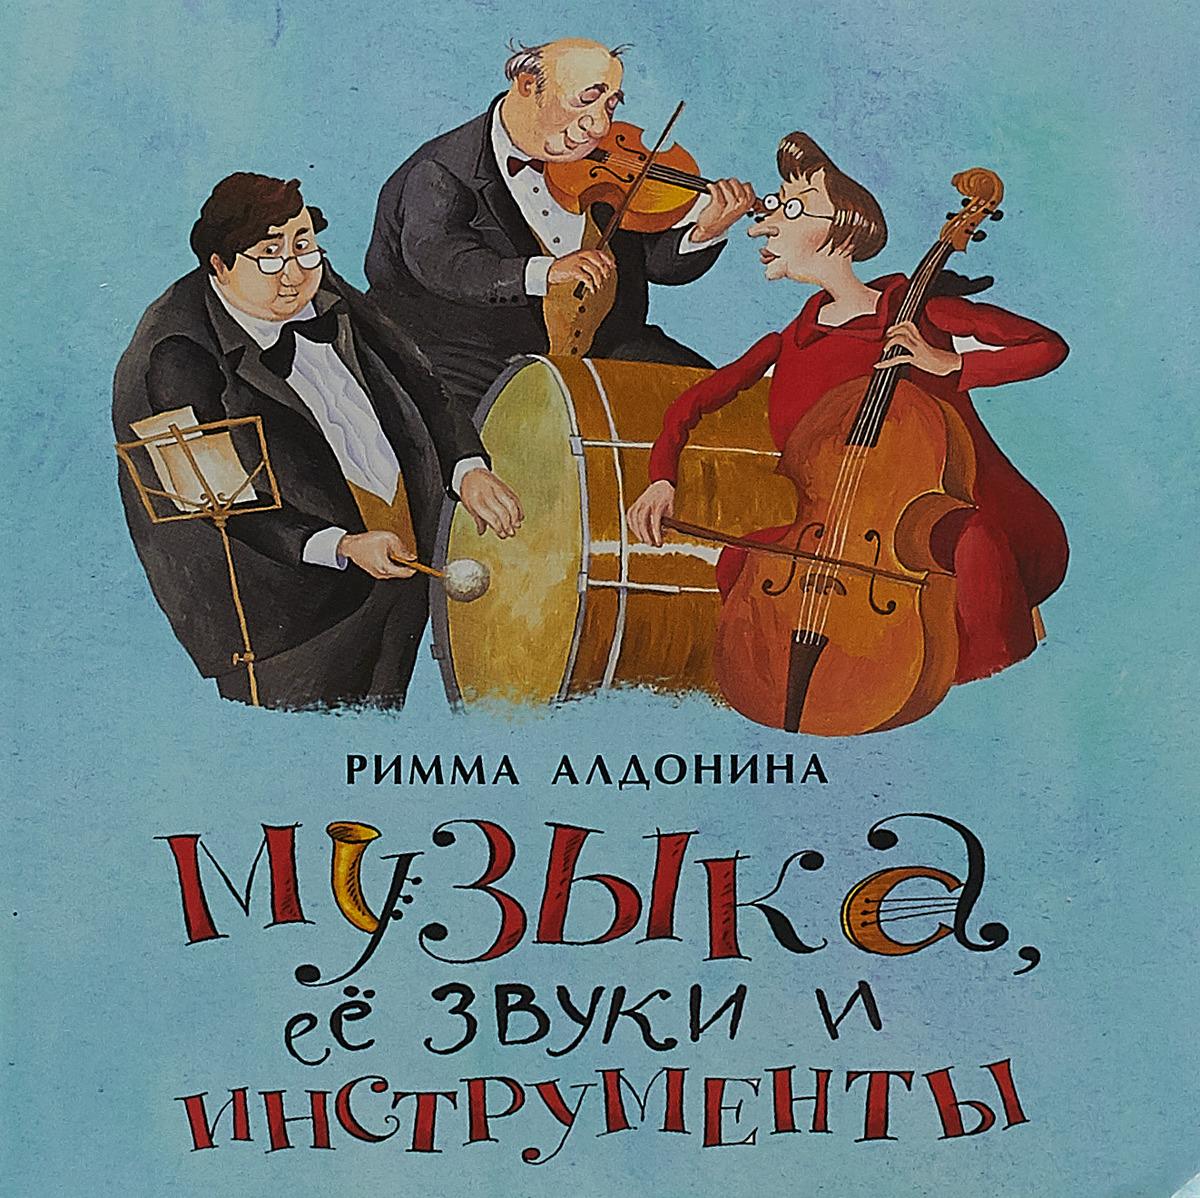 Музыка, ее звуки и инструменты, Римма Алдонина